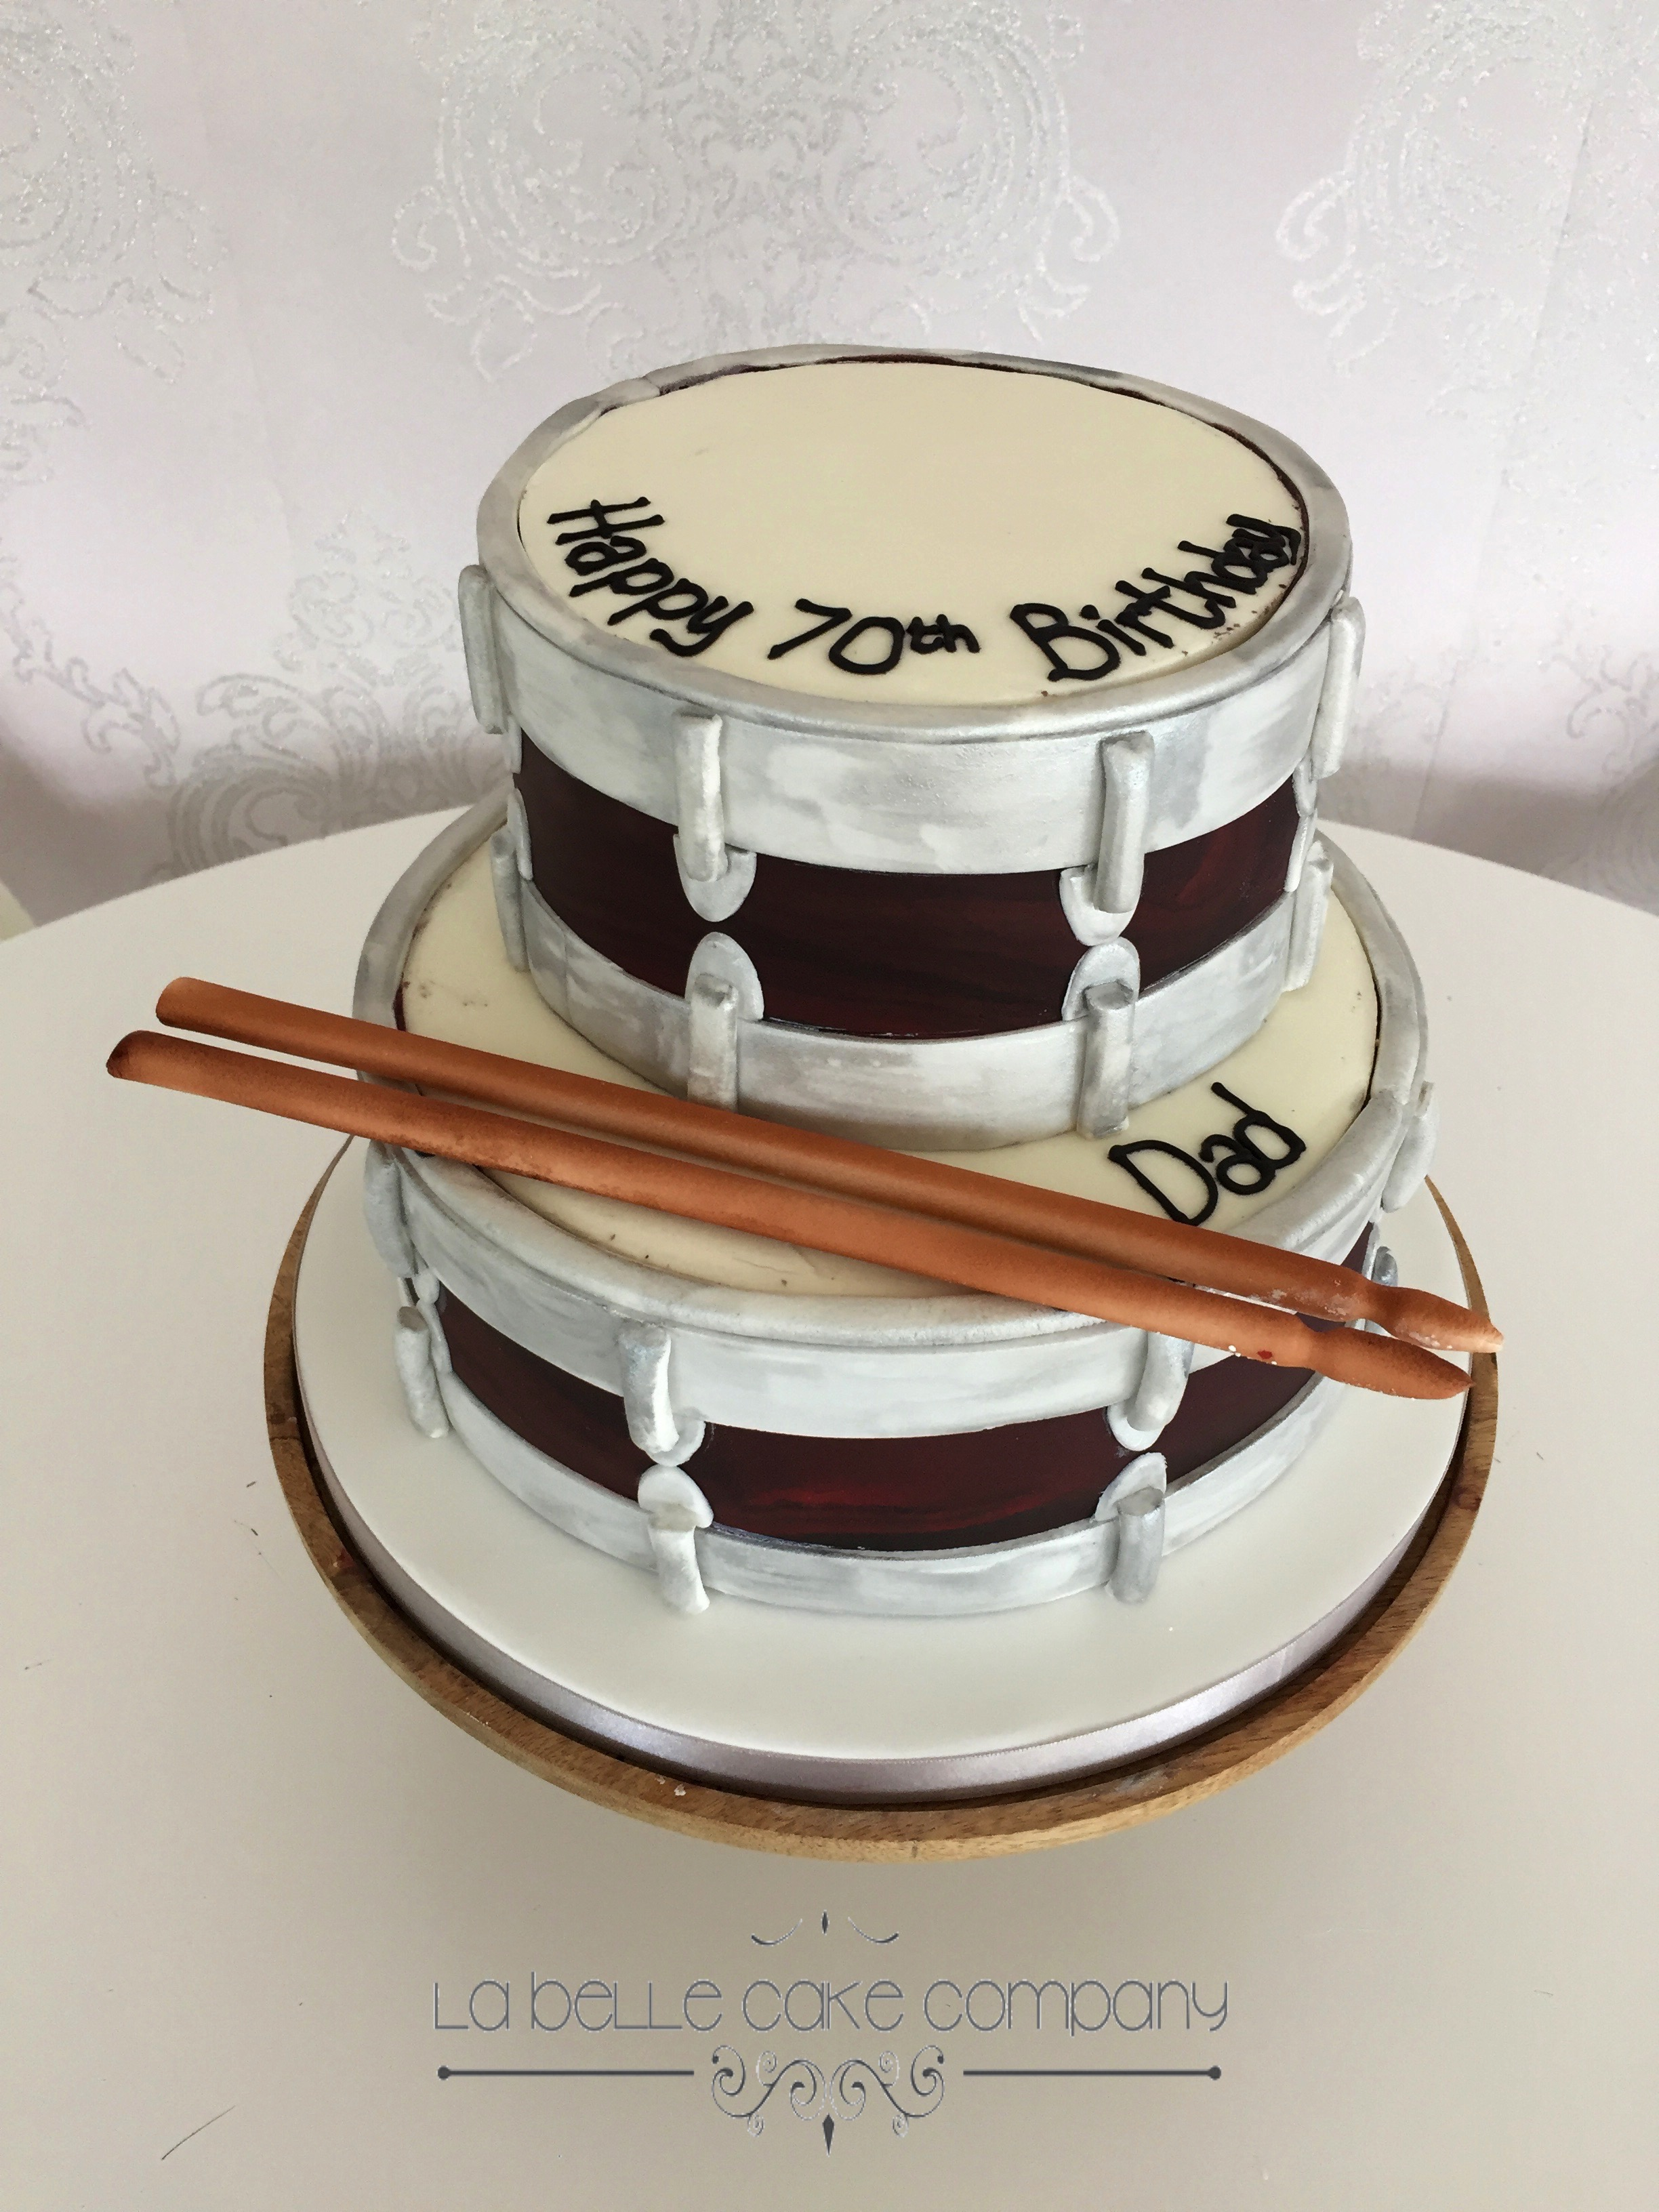 Fine Male Birthday Cakes Bedfordshire Hertfordshire Buckinghamshire Personalised Birthday Cards Paralily Jamesorg